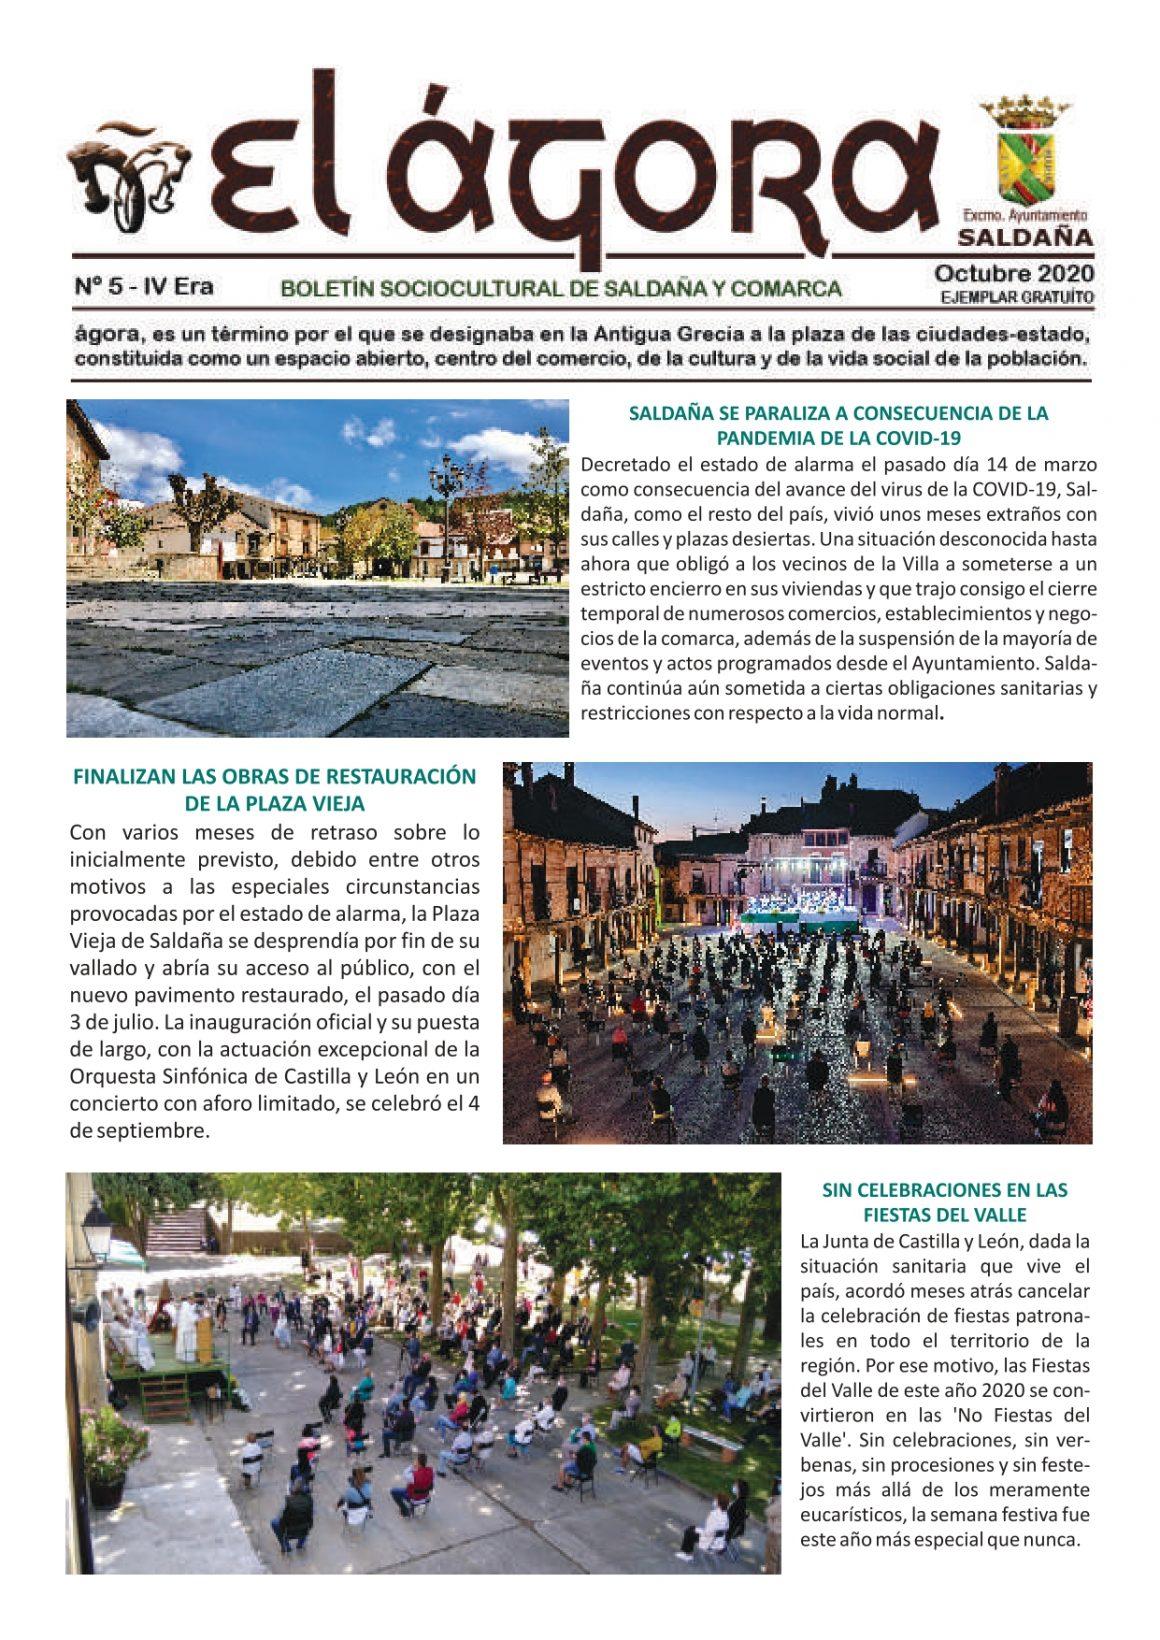 Ya disponible el número 5 de la revista gratuita 'El Ágora'